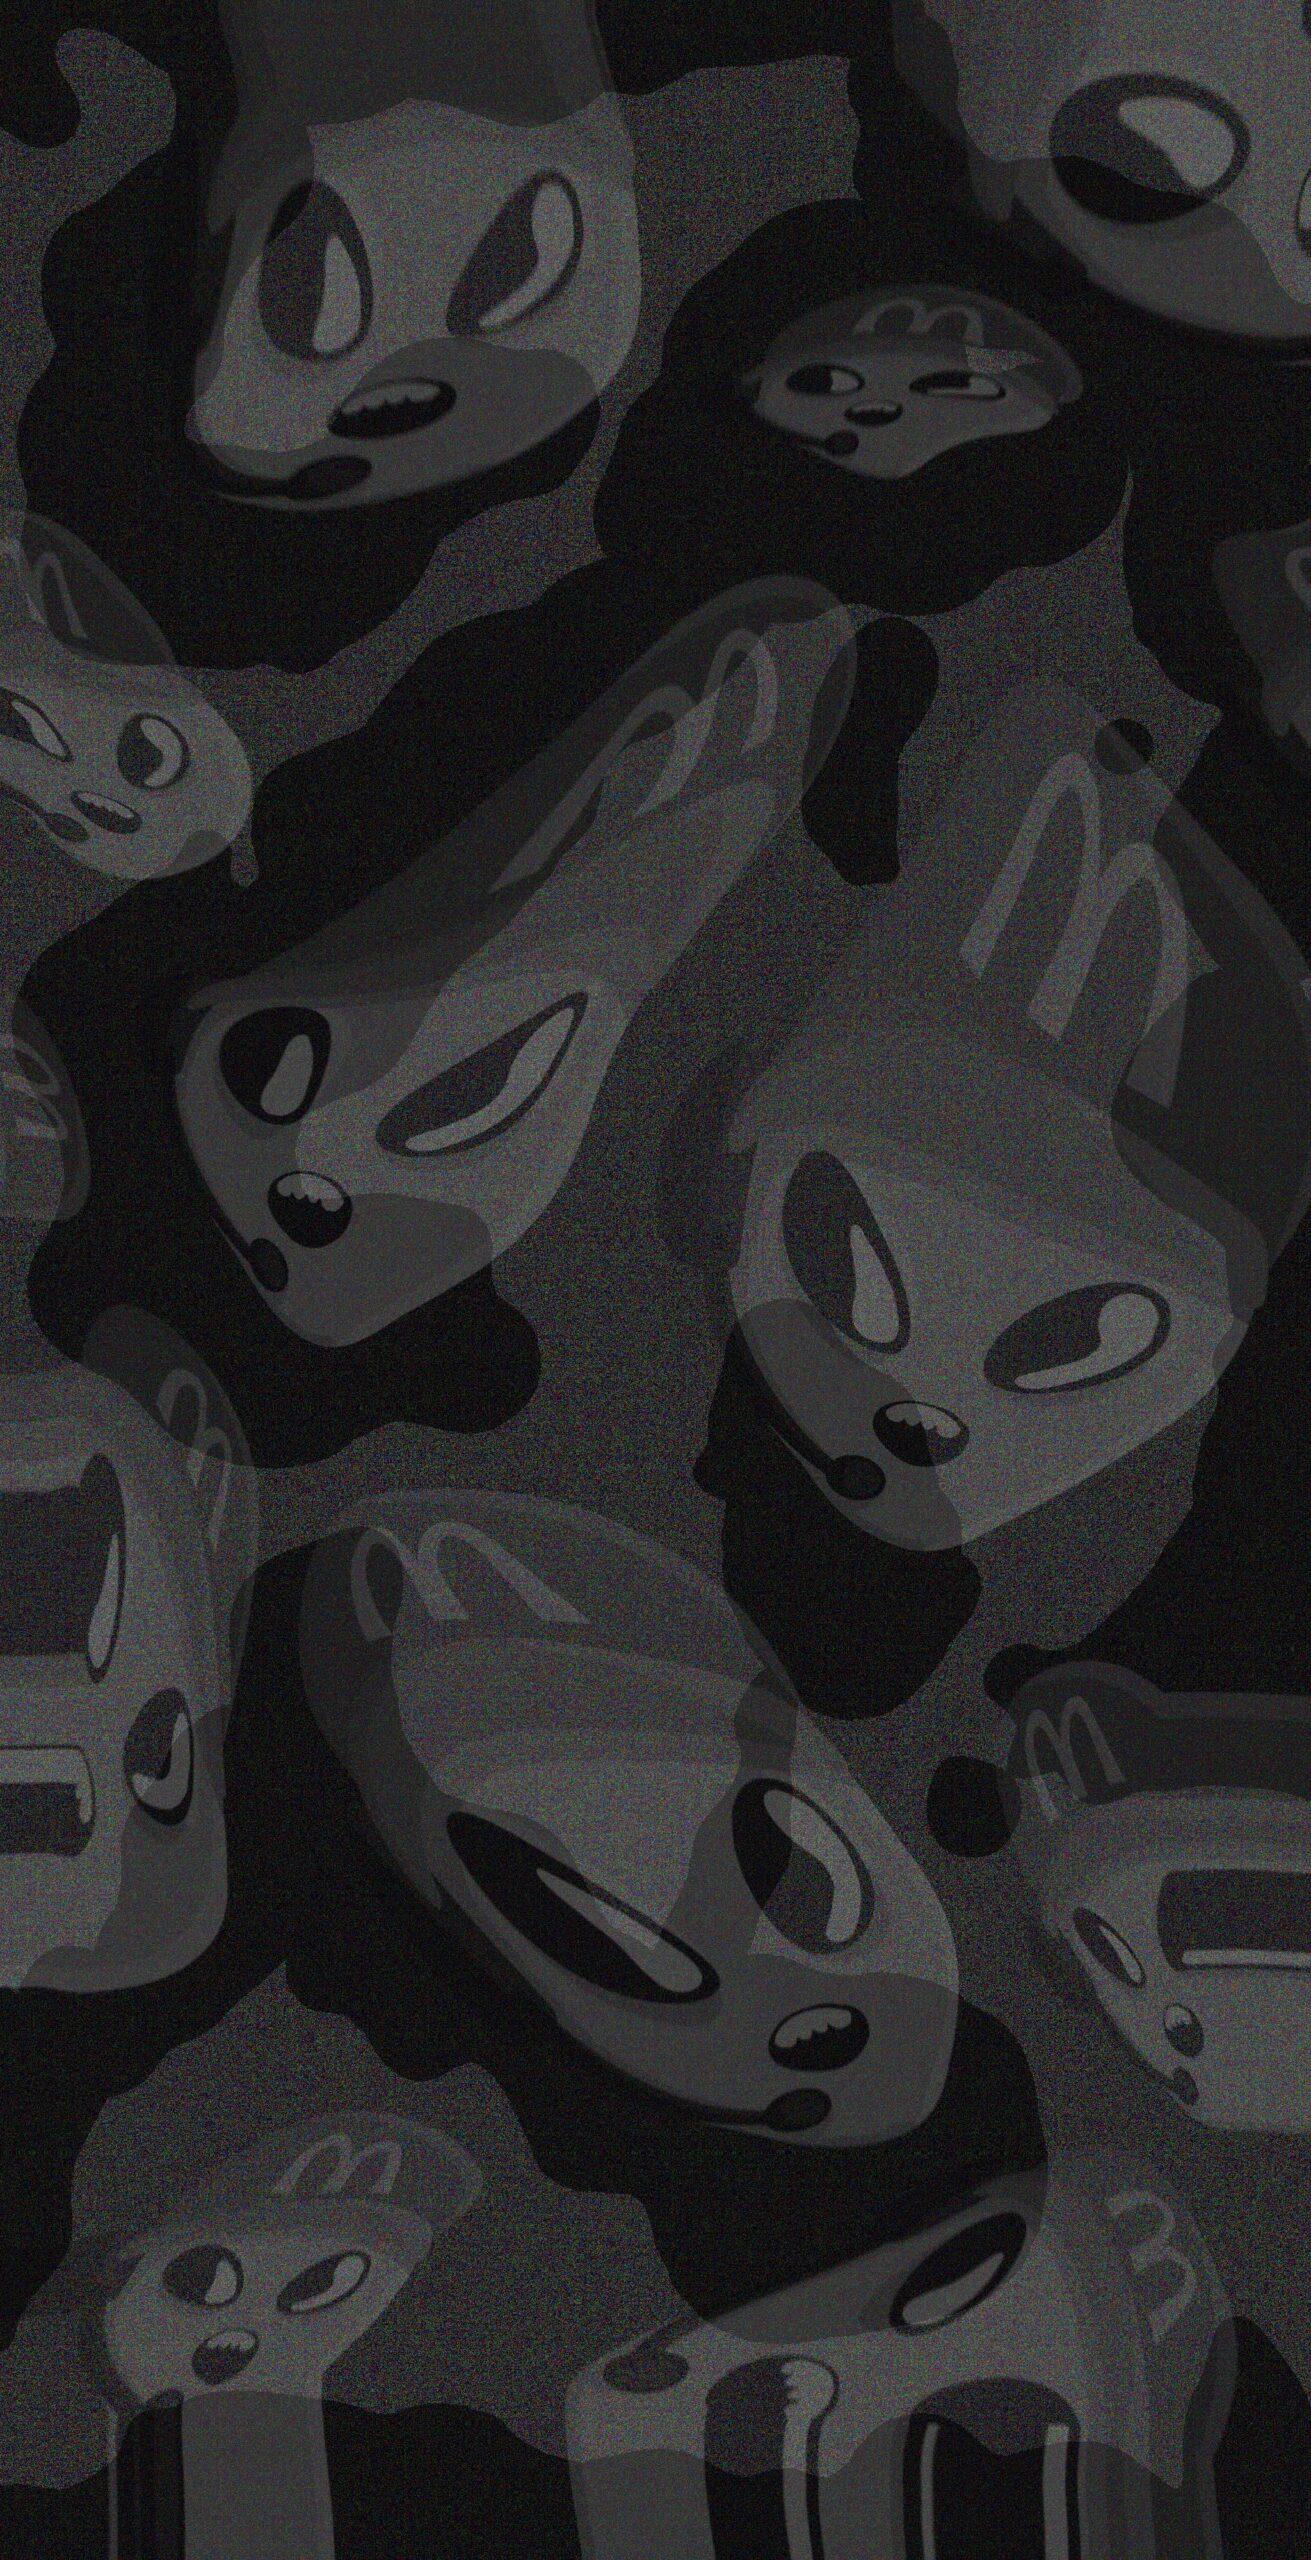 space green alien mcdonalds employee background wallpaper